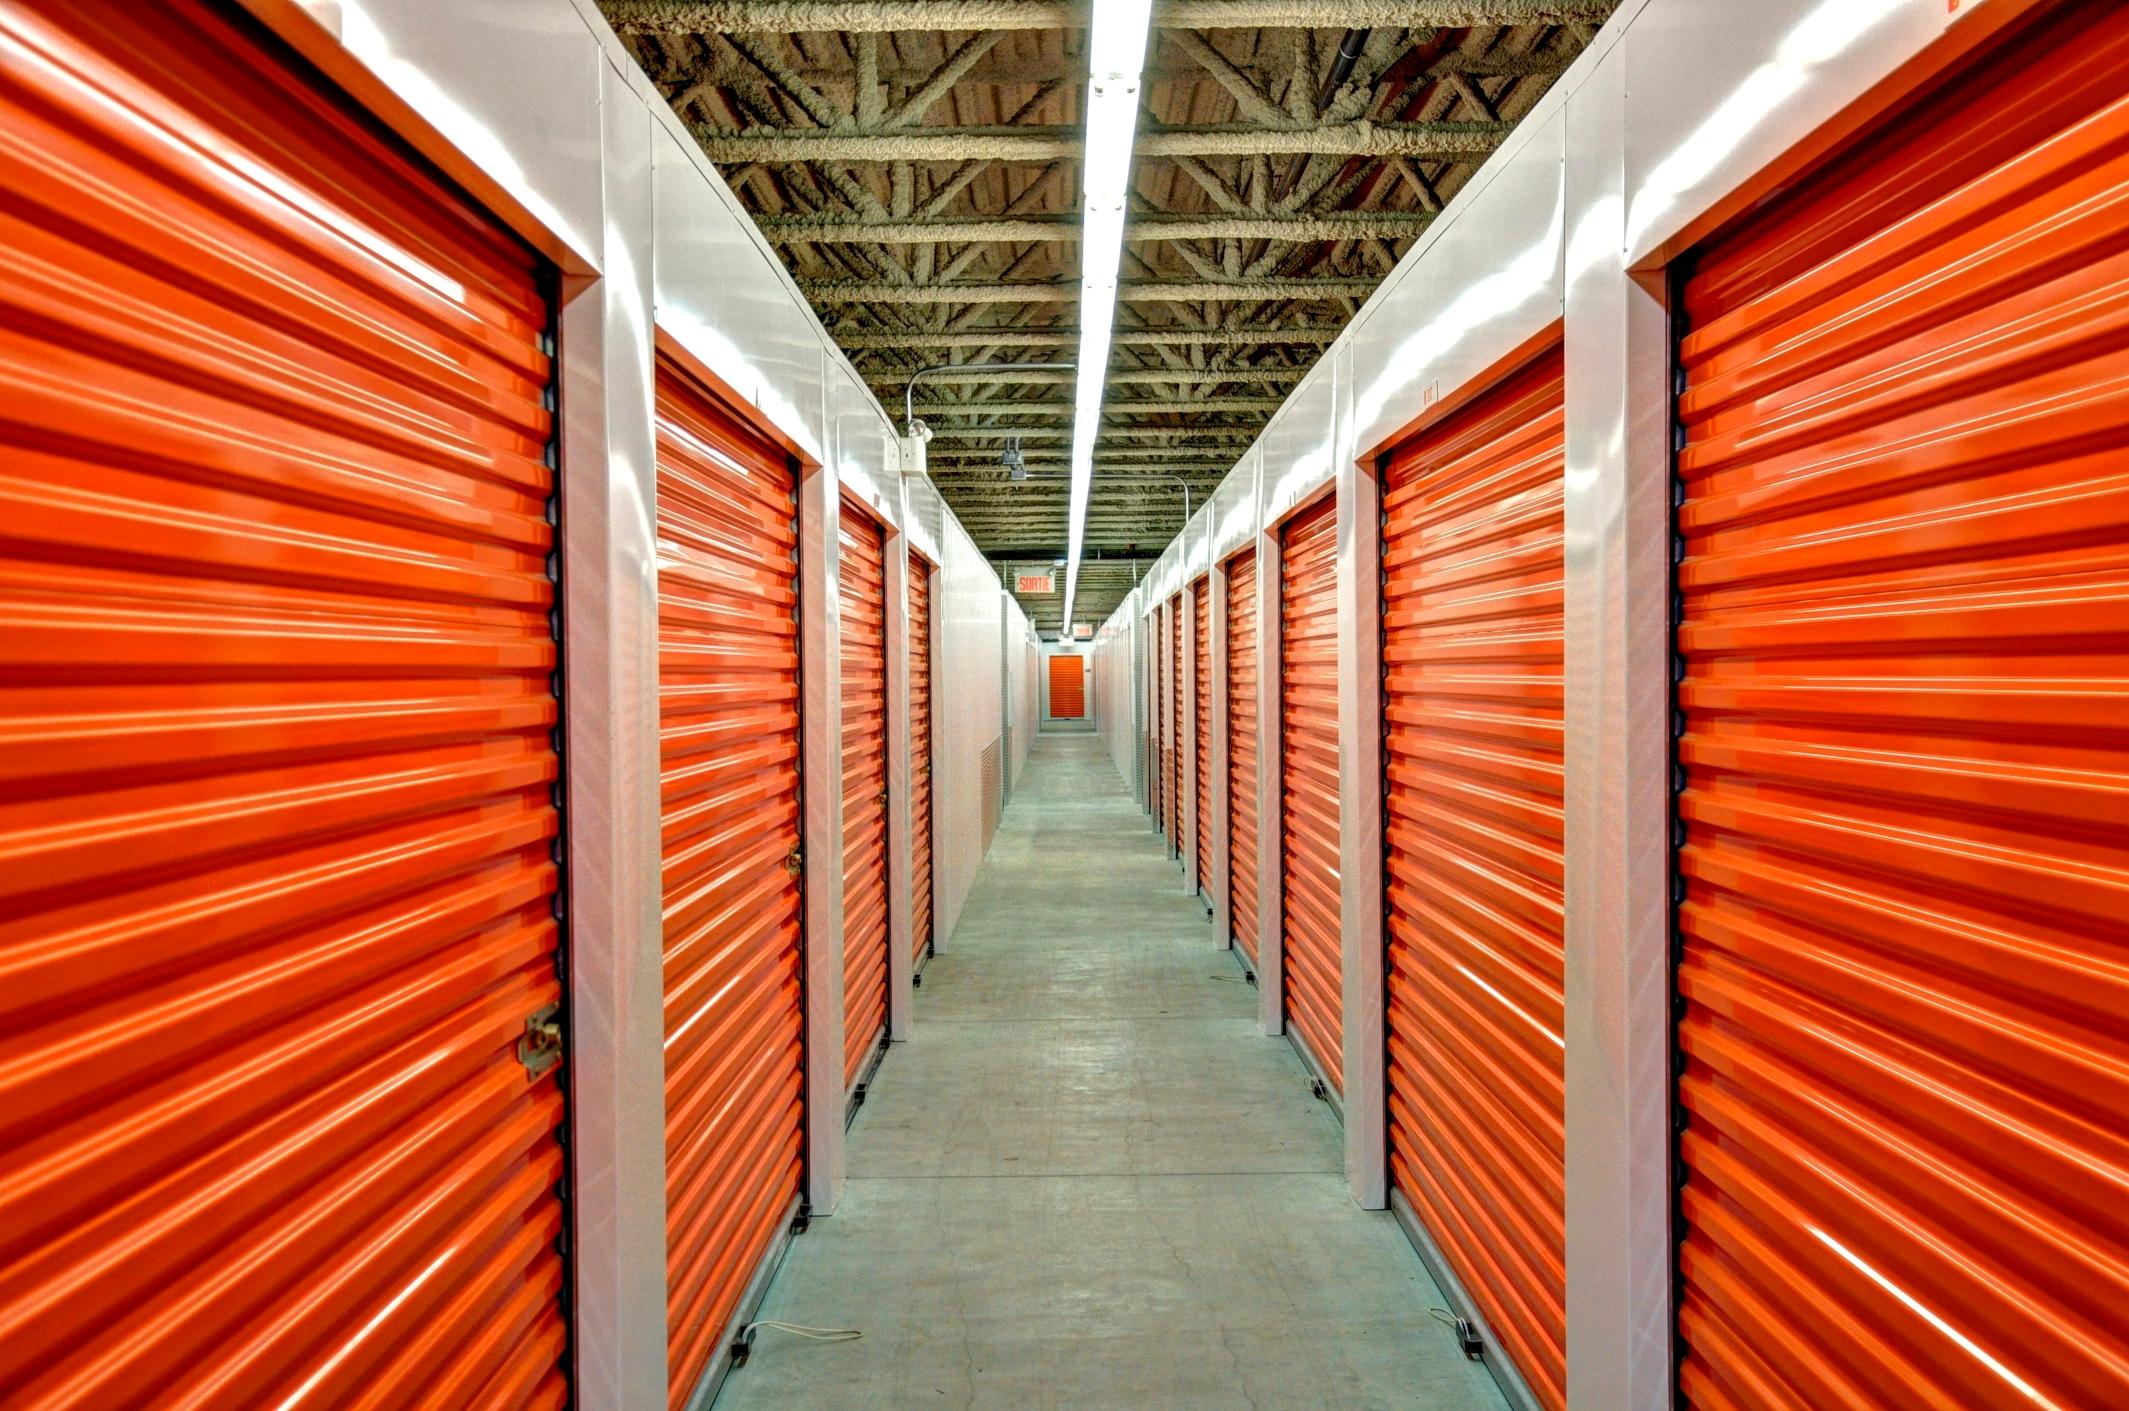 E Z Mini Storage 1019 W Hollis St Nashua, NH Warehouses Merchandise U0026 Self  Storage   MapQuest